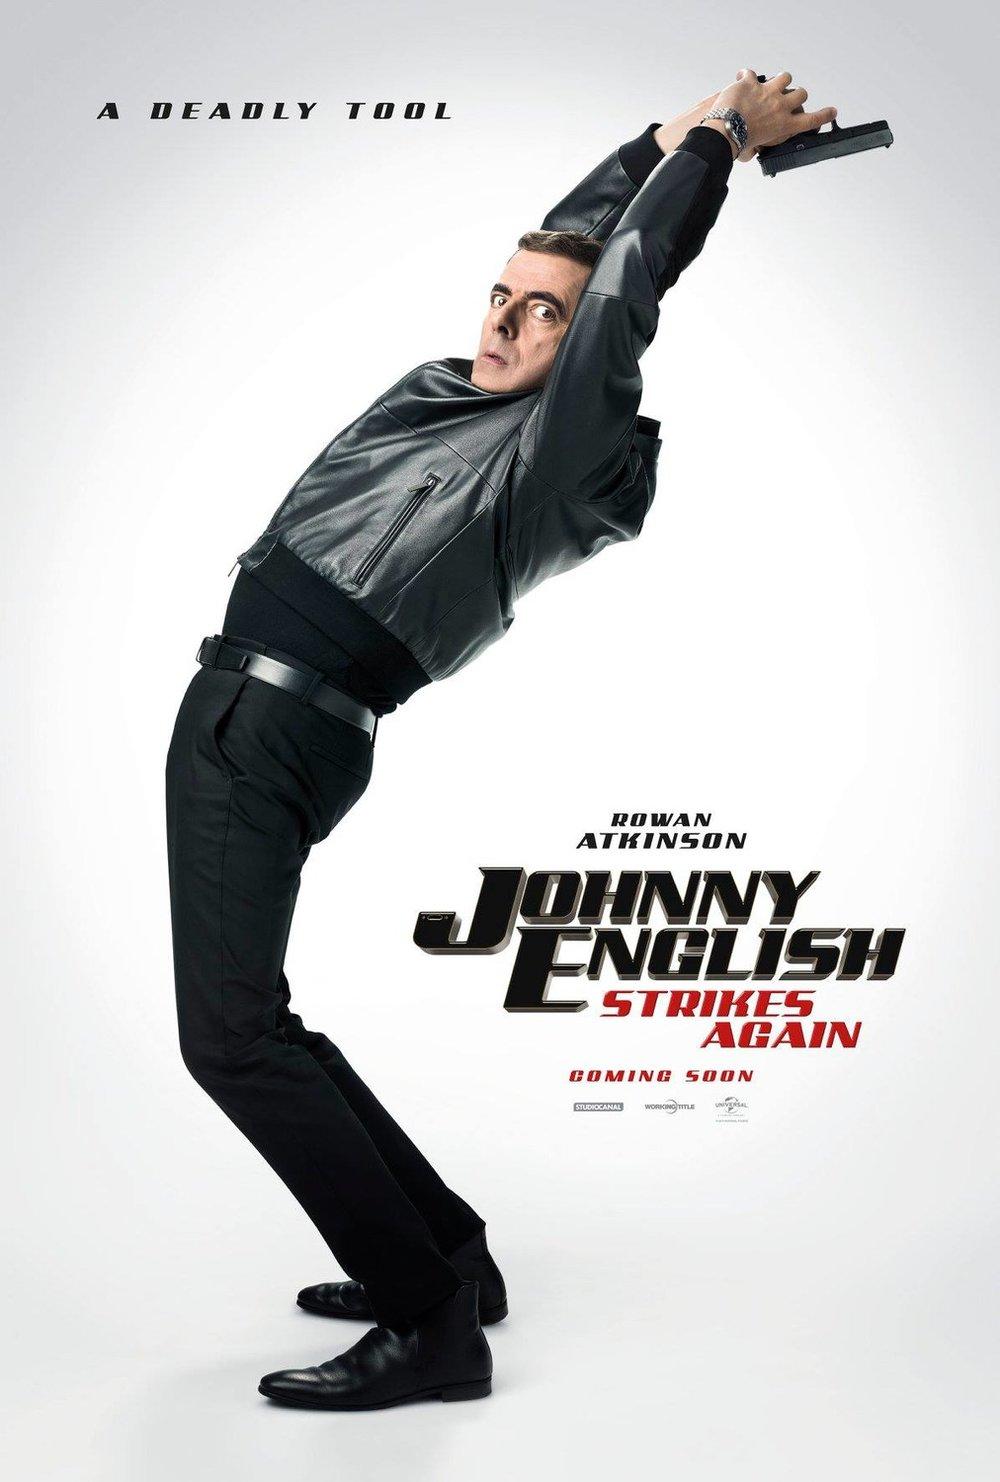 johnny_english_strikes_again_ver6_xlg.jpg